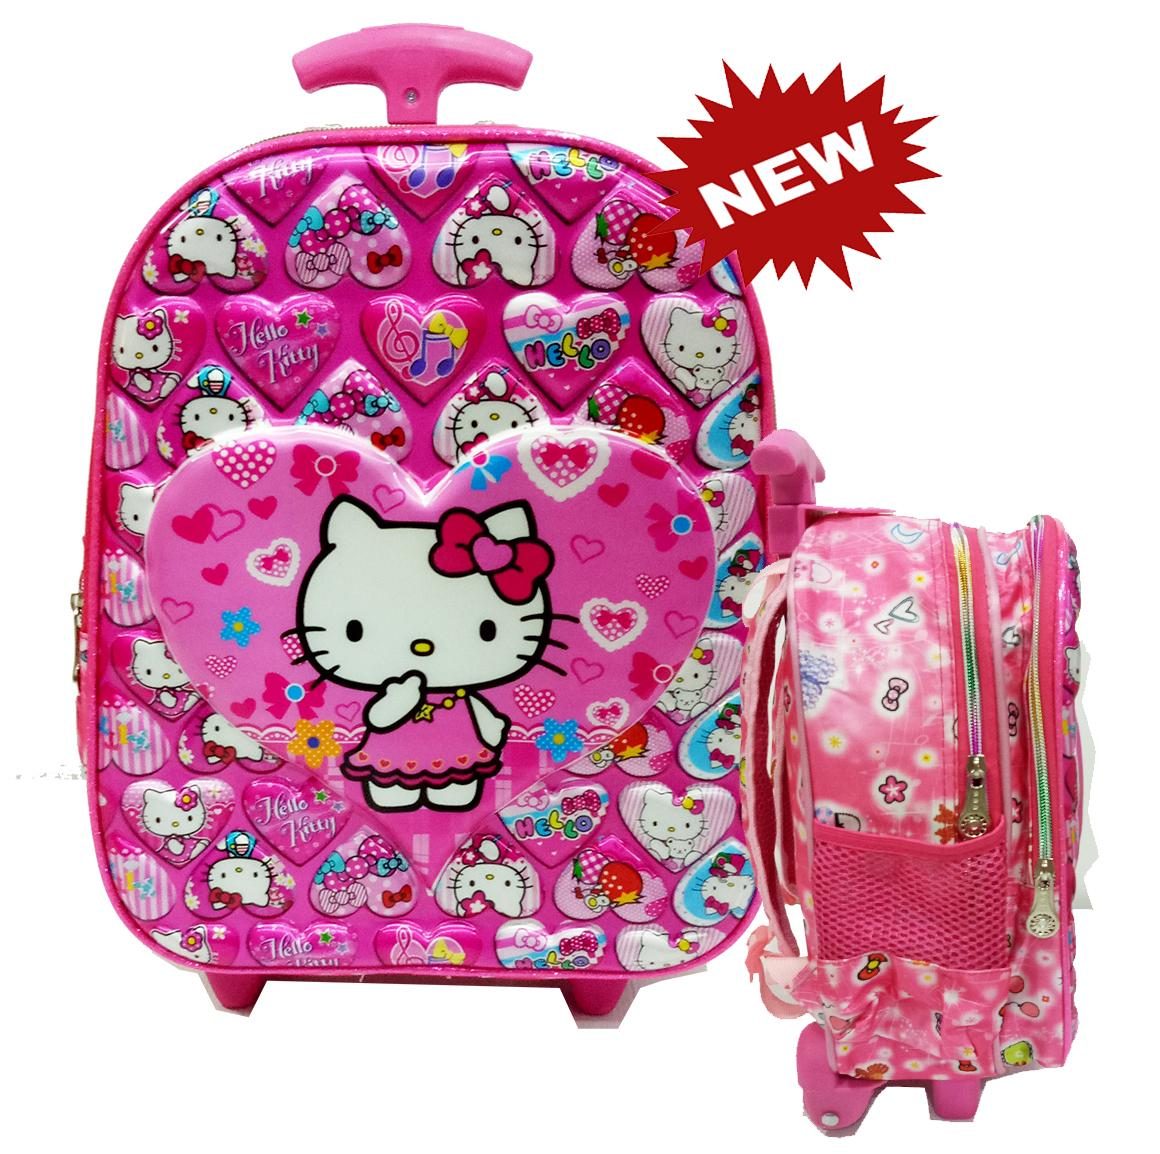 Onlan Hello Kitty 5D Timbul Tas Anak Sekolah TK New Arrival Import - Pink